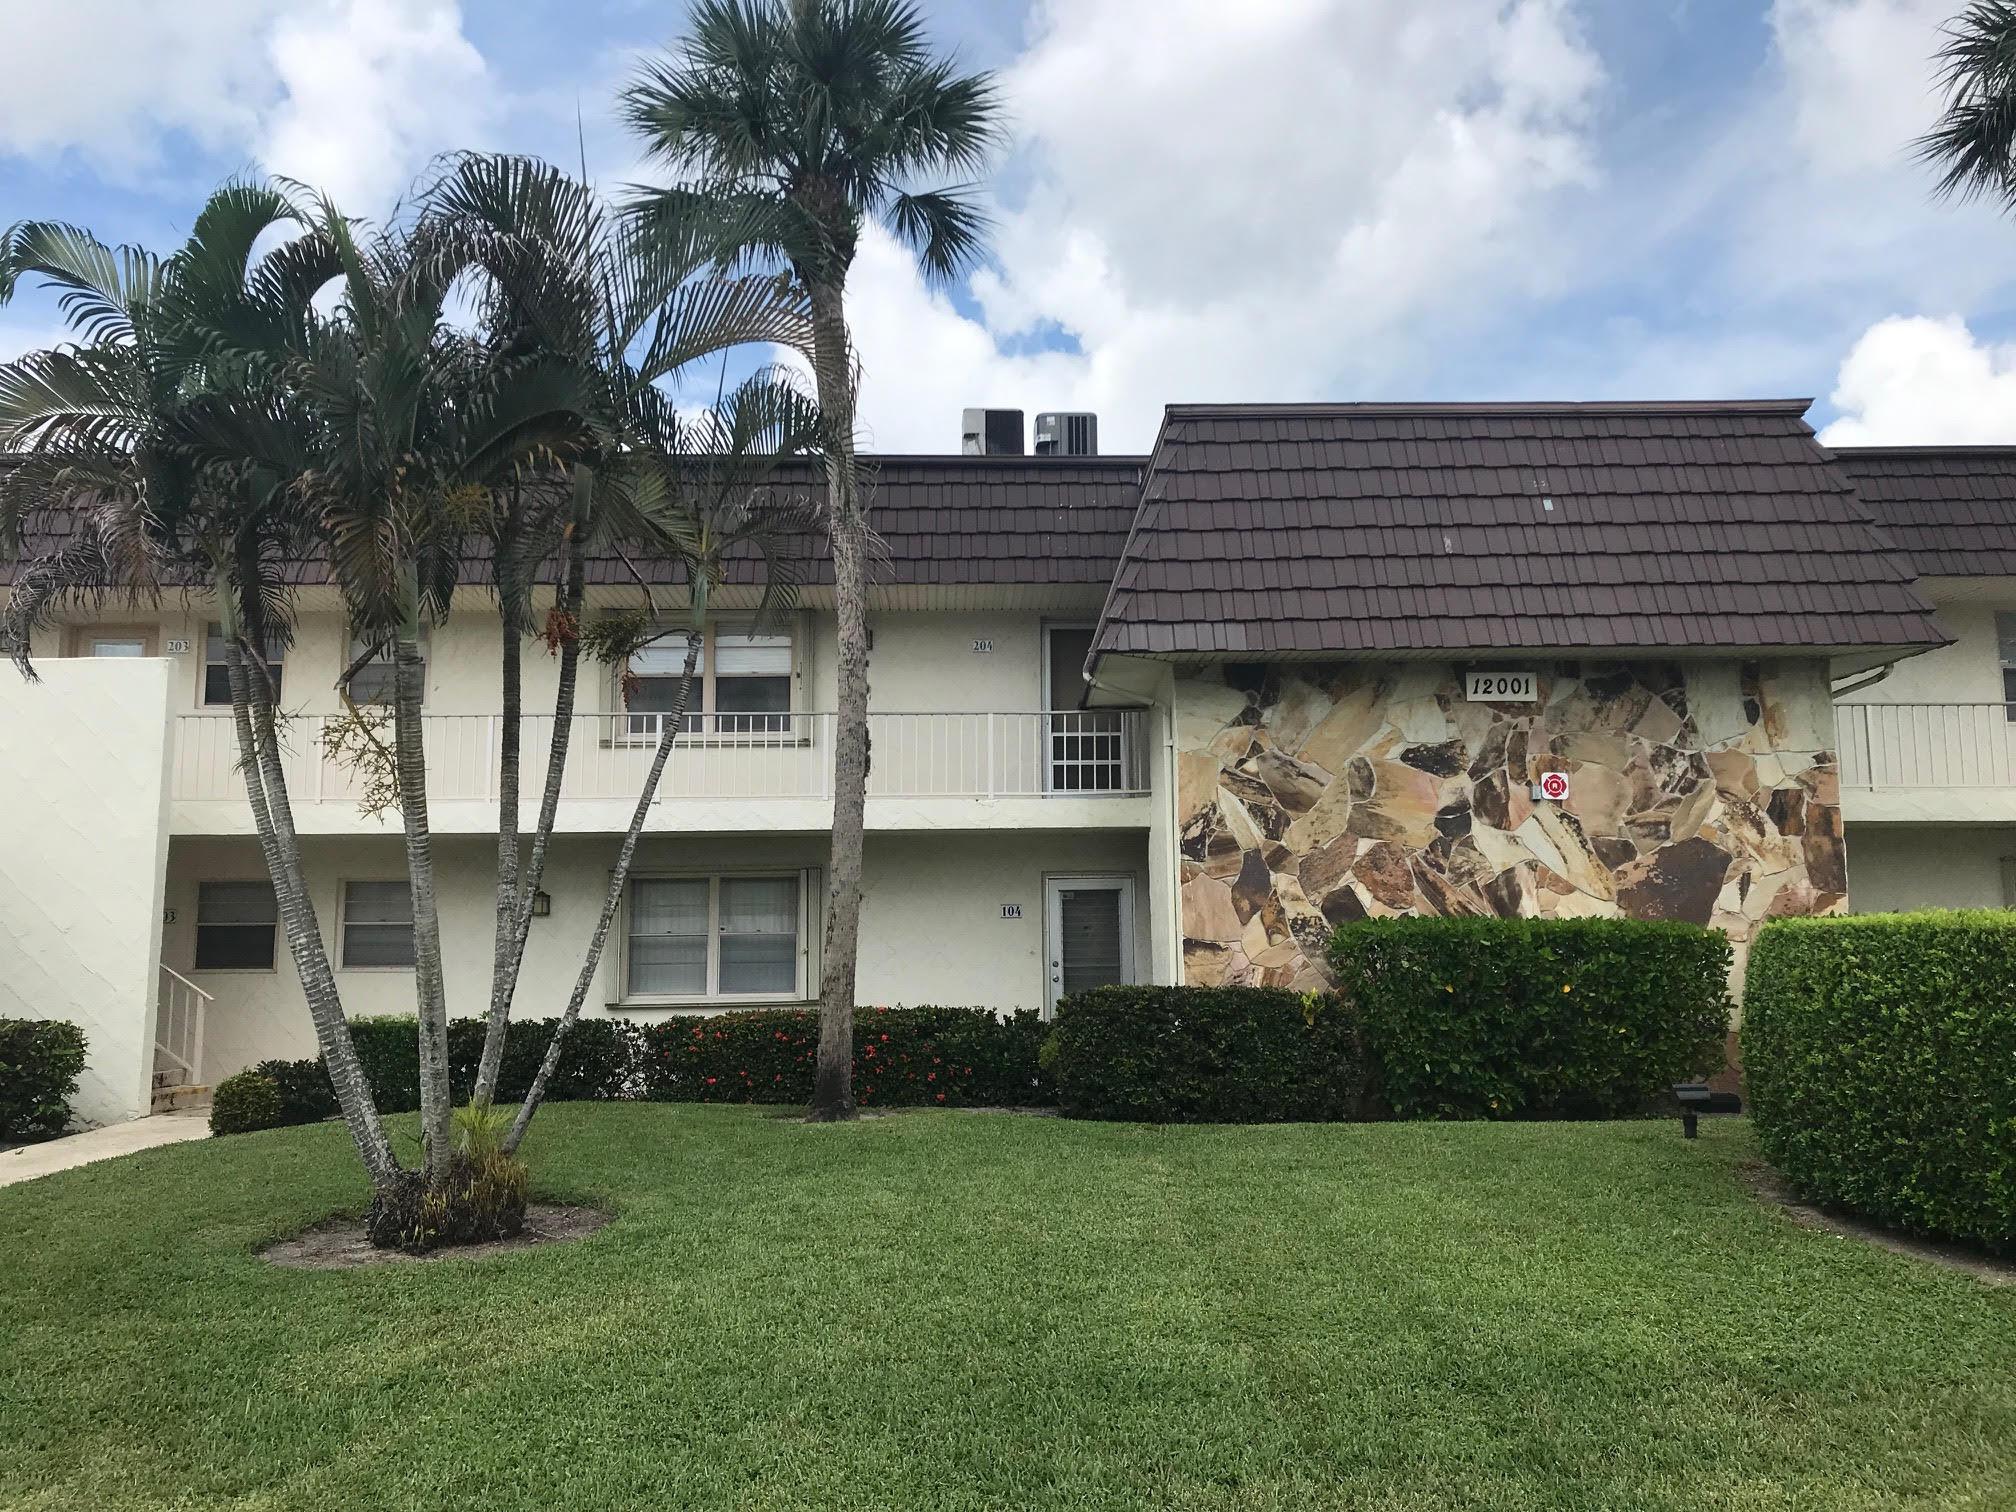 12001 Poinciana Boulevard 204 Royal Palm Beach, FL 33411